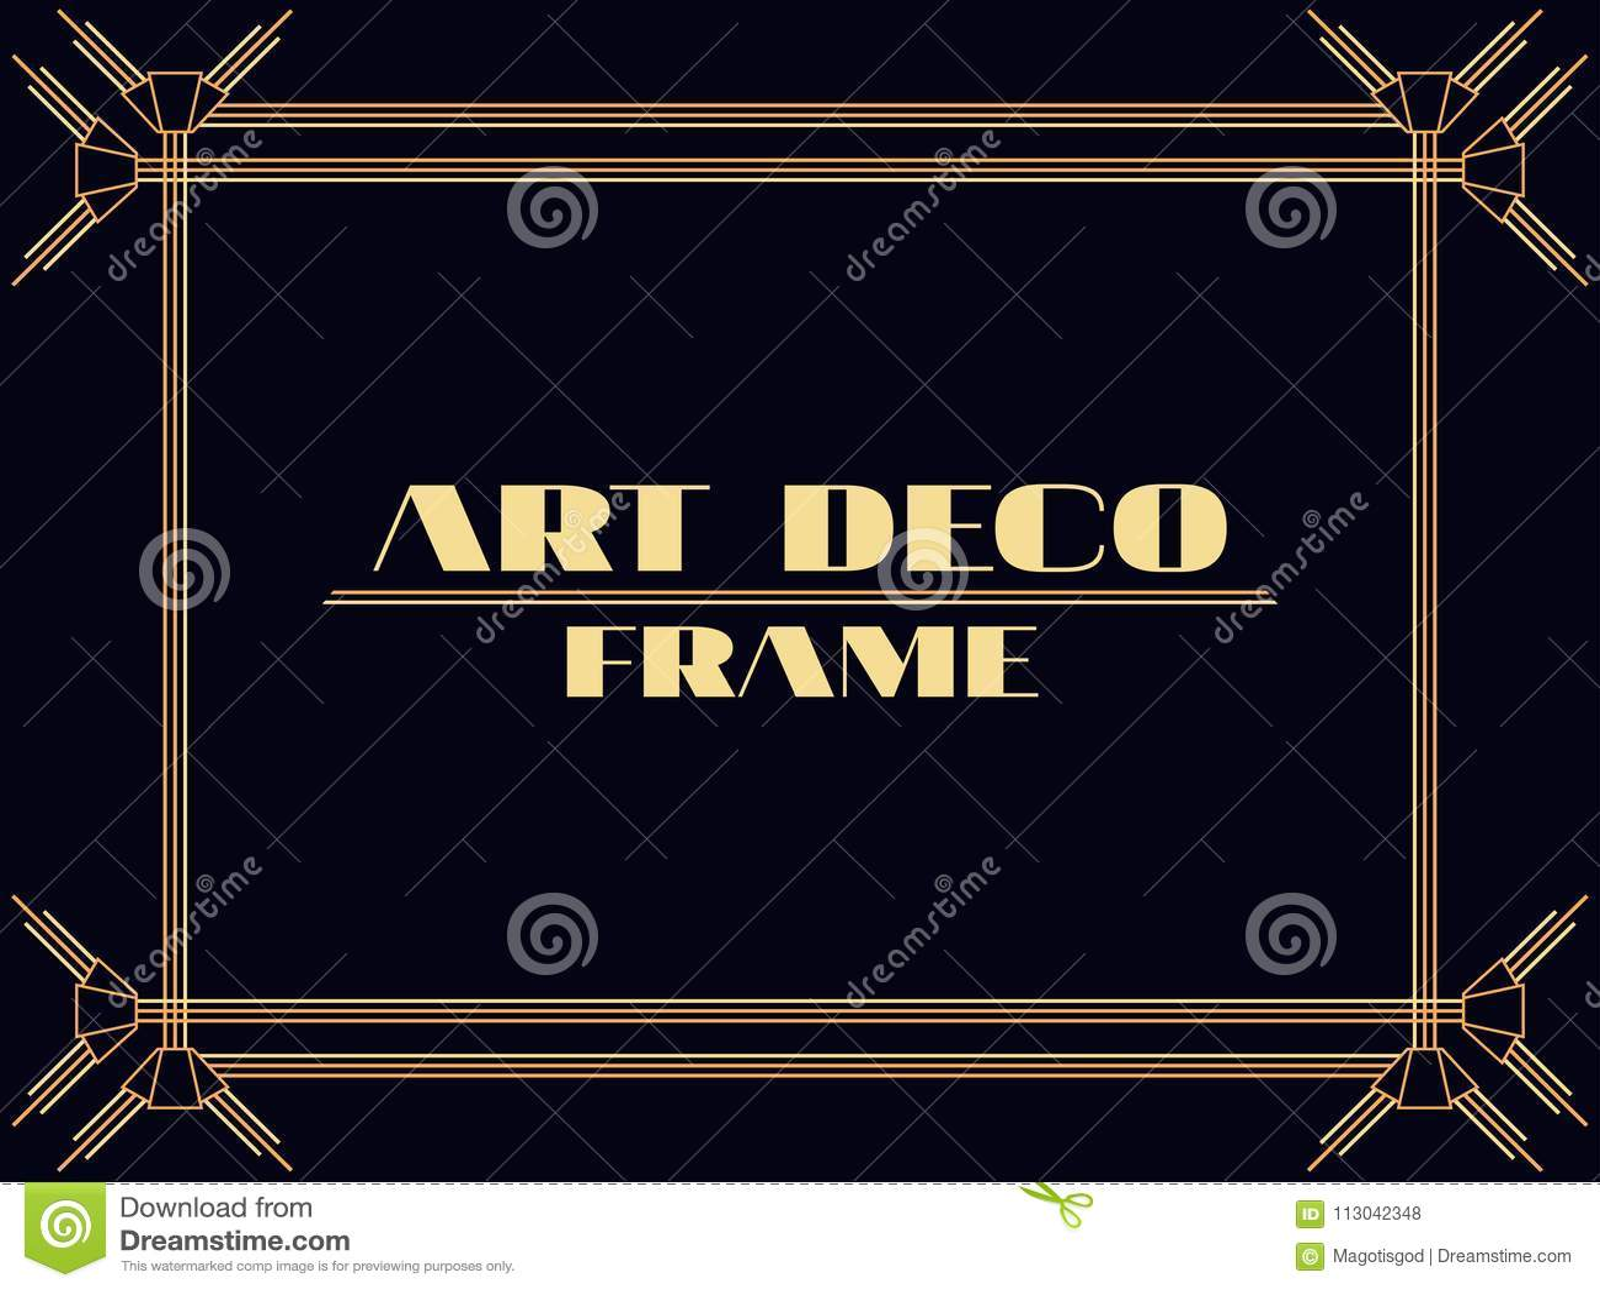 art deco frame vintage linear border design a template for